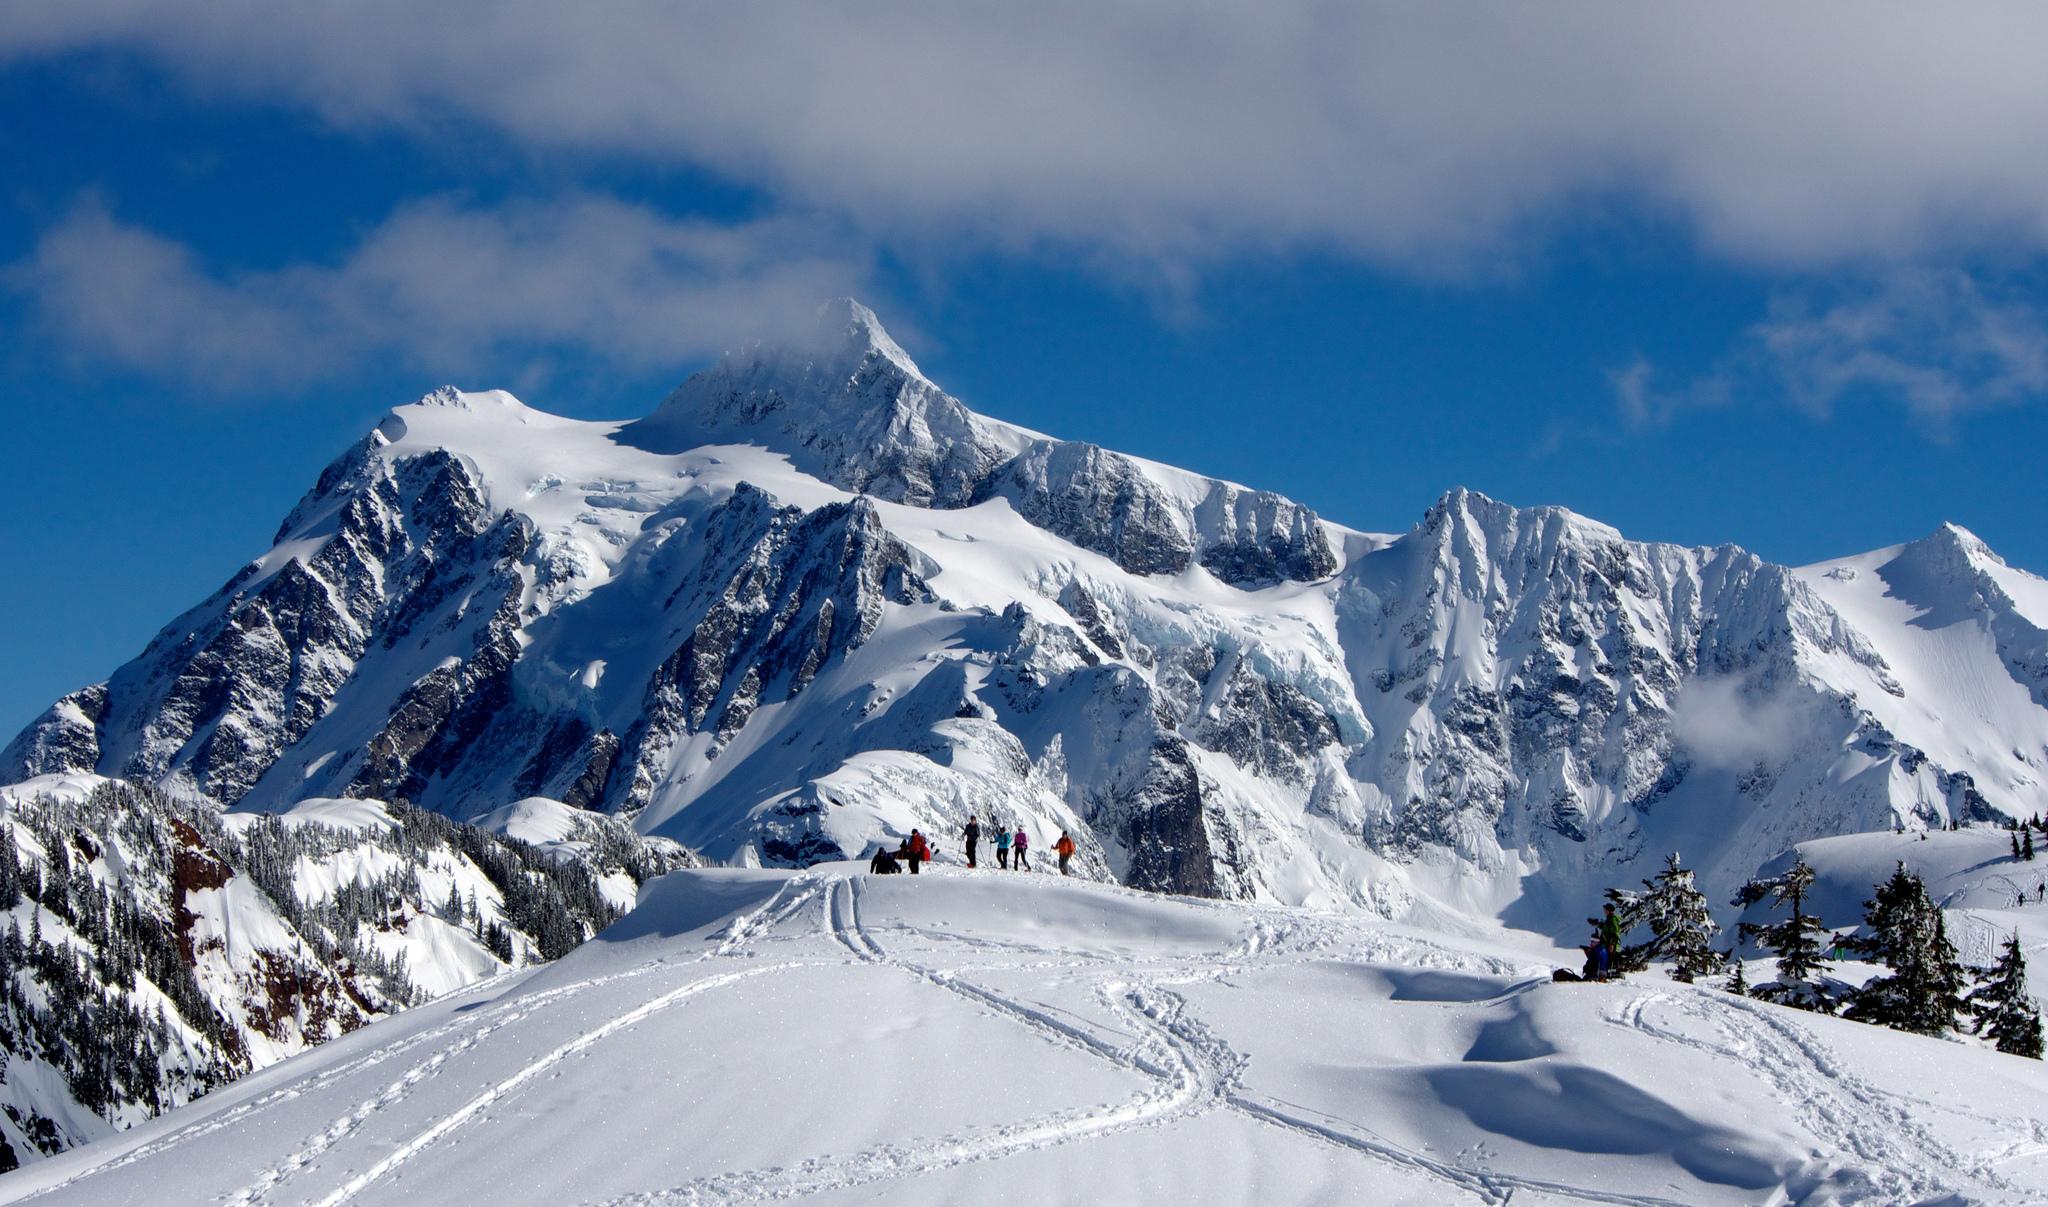 Snowshoers in front of Mount Shuksan. Photo by Eugene Kogan.jpg